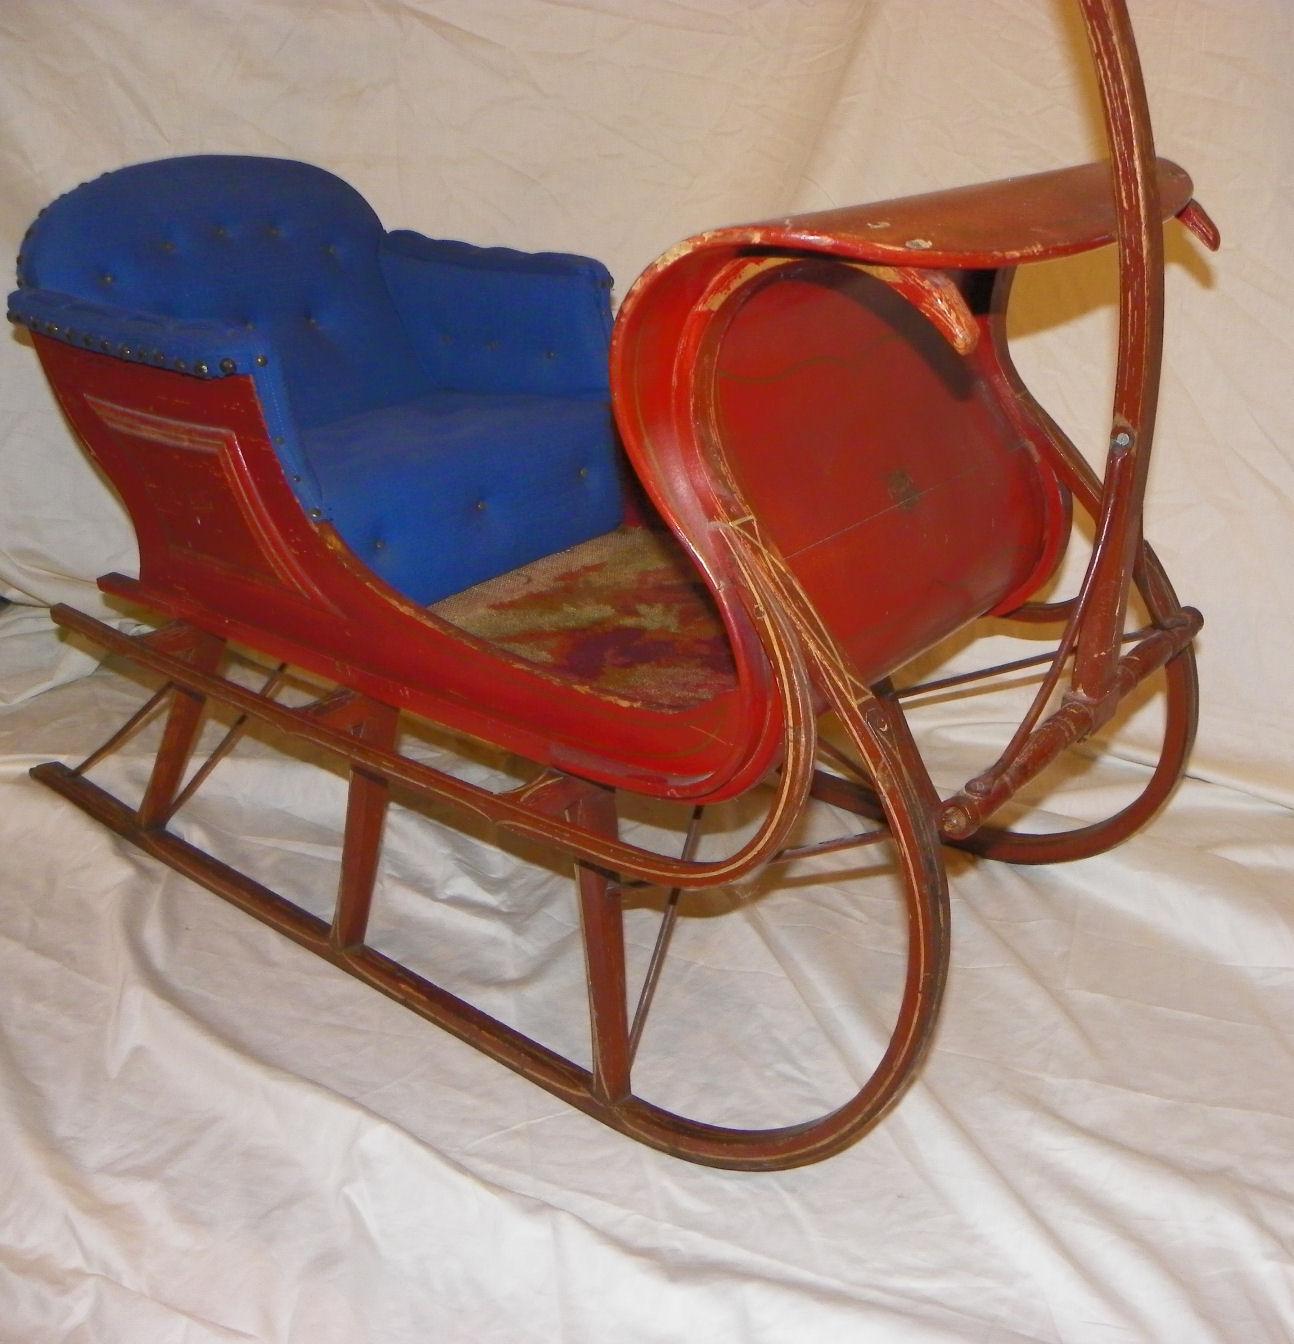 kitchen clocks ikea cart bargain john's antiques | antique victorian childs painted ...